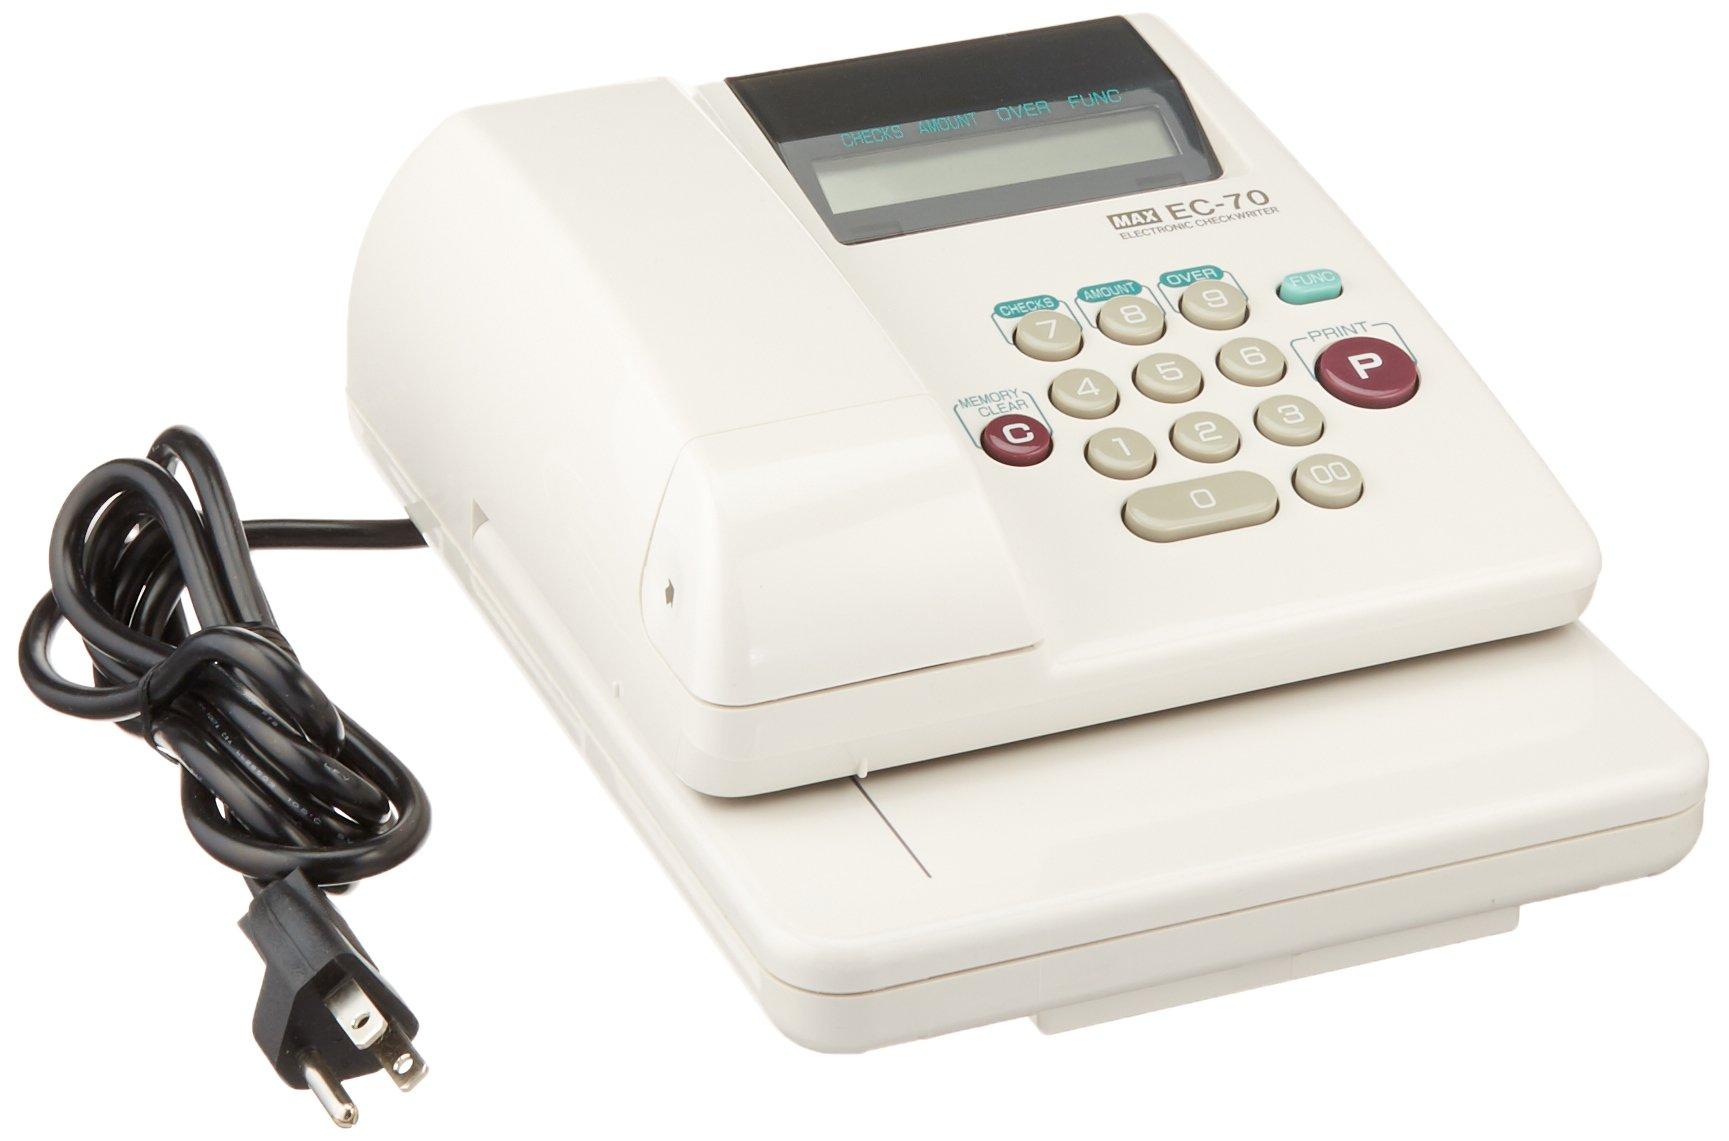 Max EC-70 Max Model EC-70 Electronic Checkwriter, 14-Digit, 7-7/8w x 9-5/8d x 3-5/8h